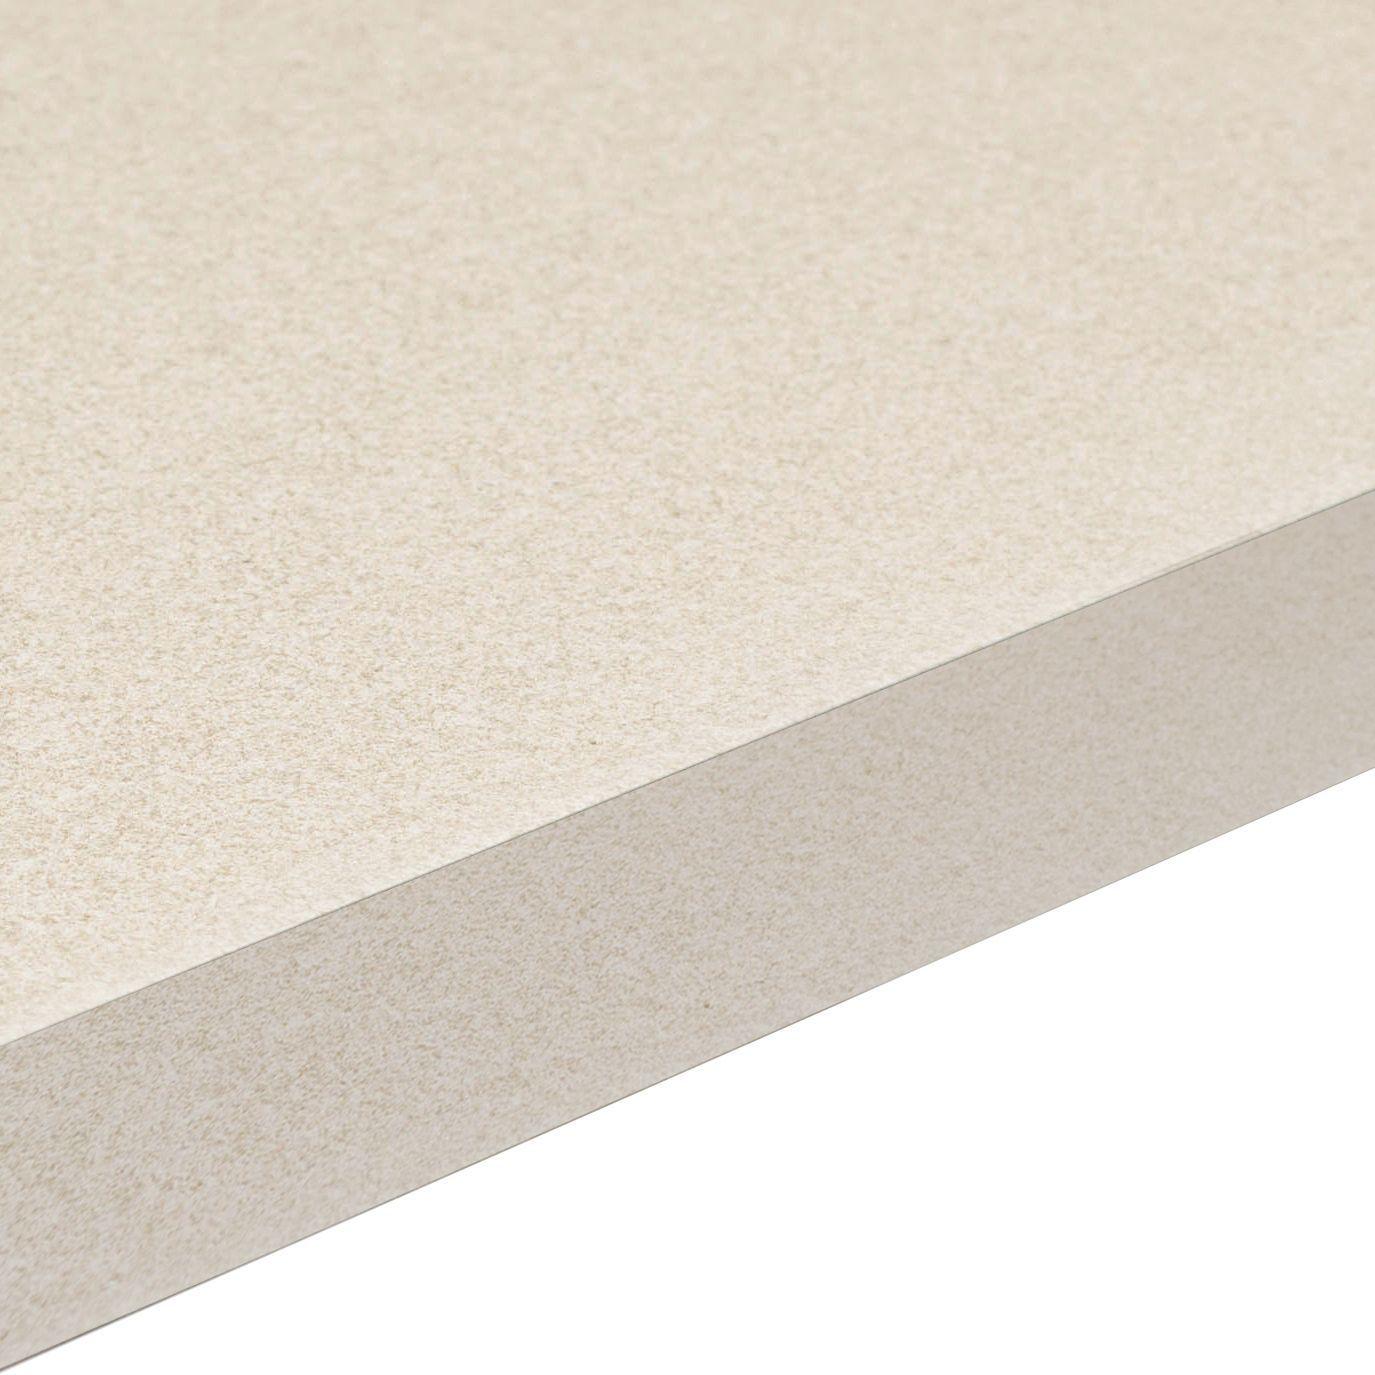 38mm Aura White Laminate Gloss Granite Effect Square Edge Worktop (L ...